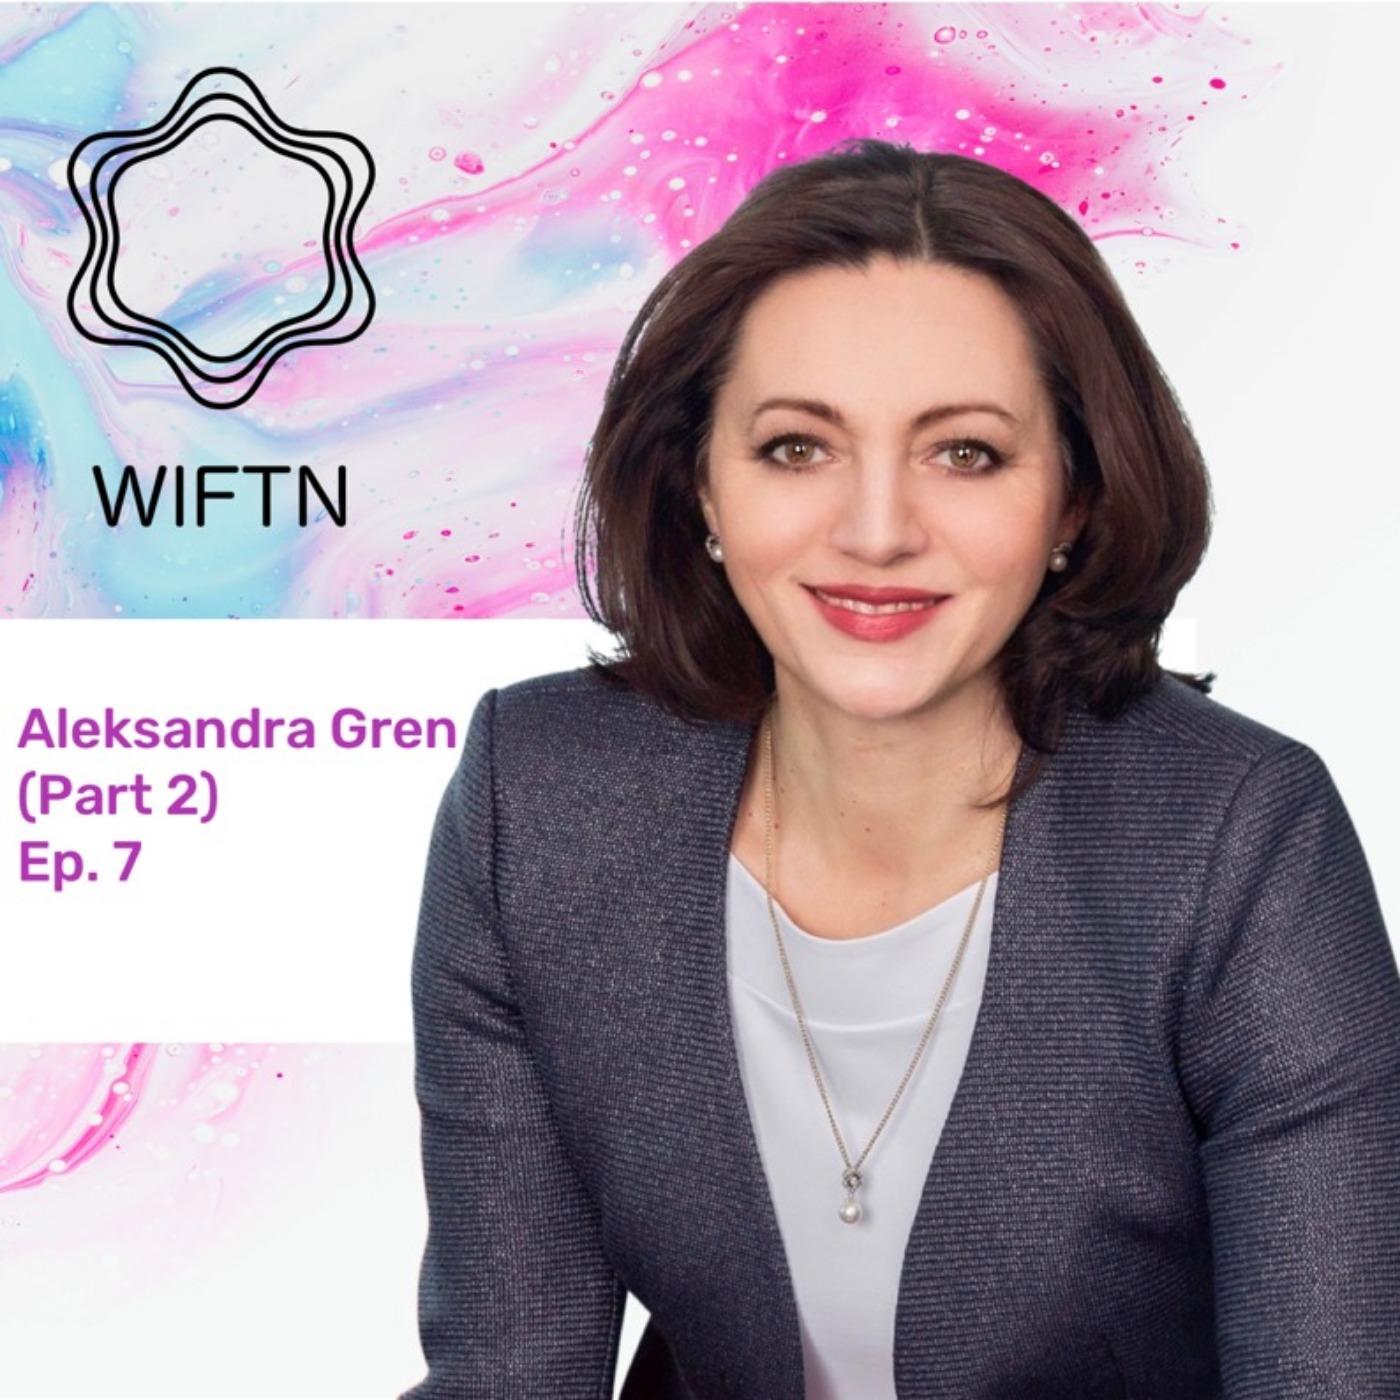 Ep 7: Aleksandra Gren - Part 2